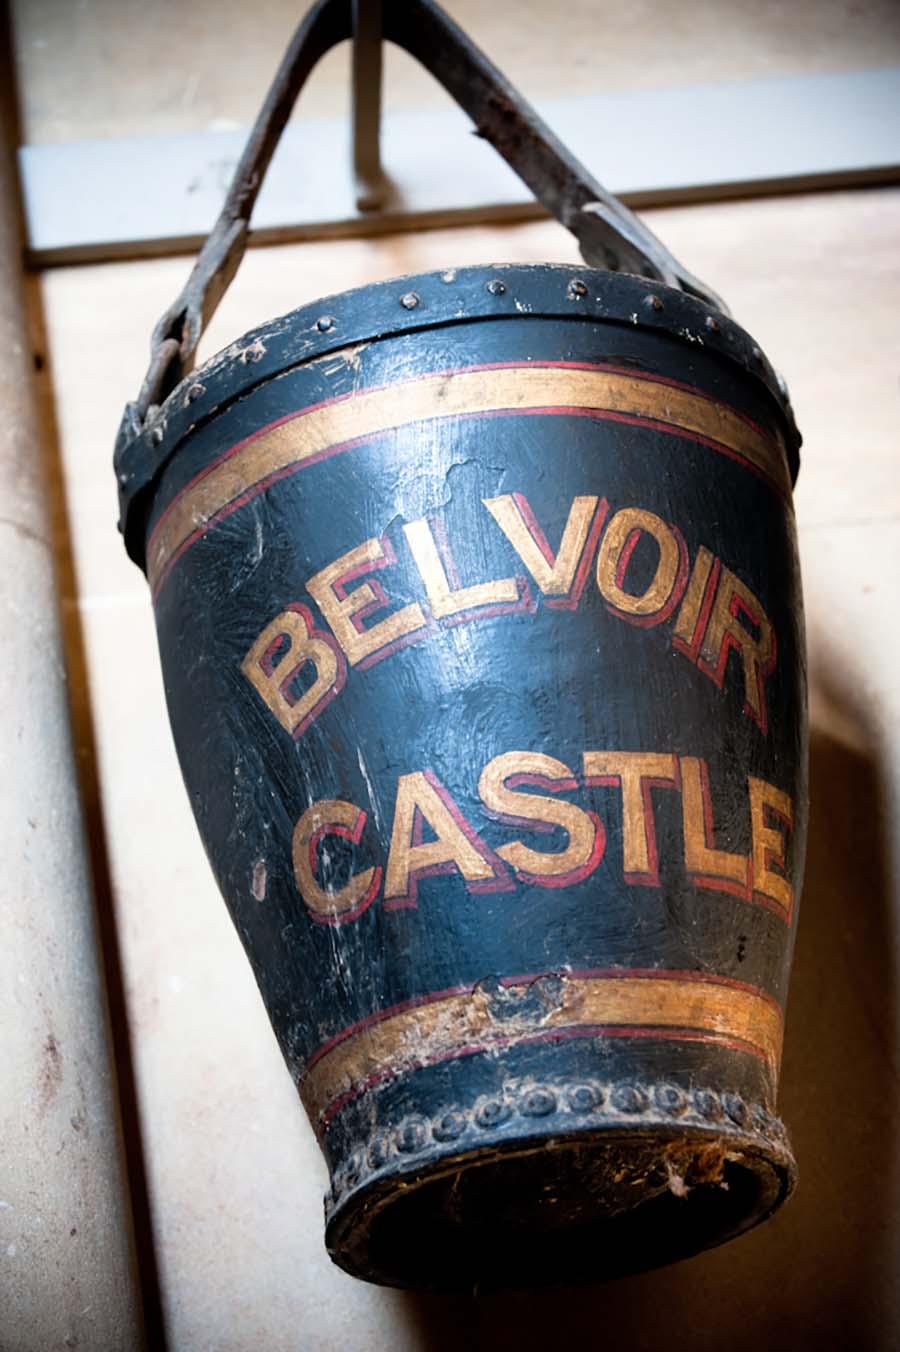 Buckinghams-at-belvoir-castle-wedding-fair-rachael-connerton-photography-28